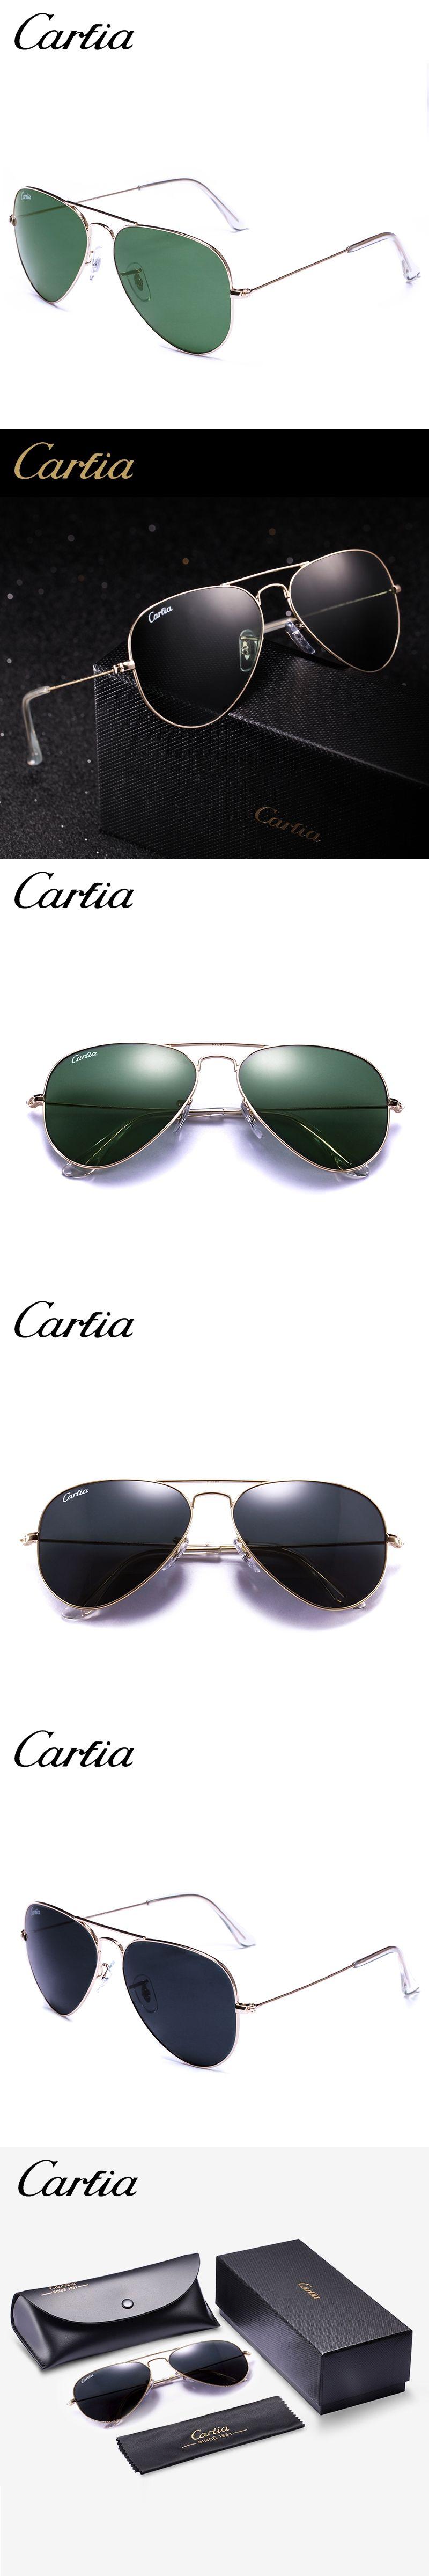 4d3a425237 Retro classical sunglasses CA 3025 pilot style gold frame green glass lens  58mm fashion carfia sunglasses